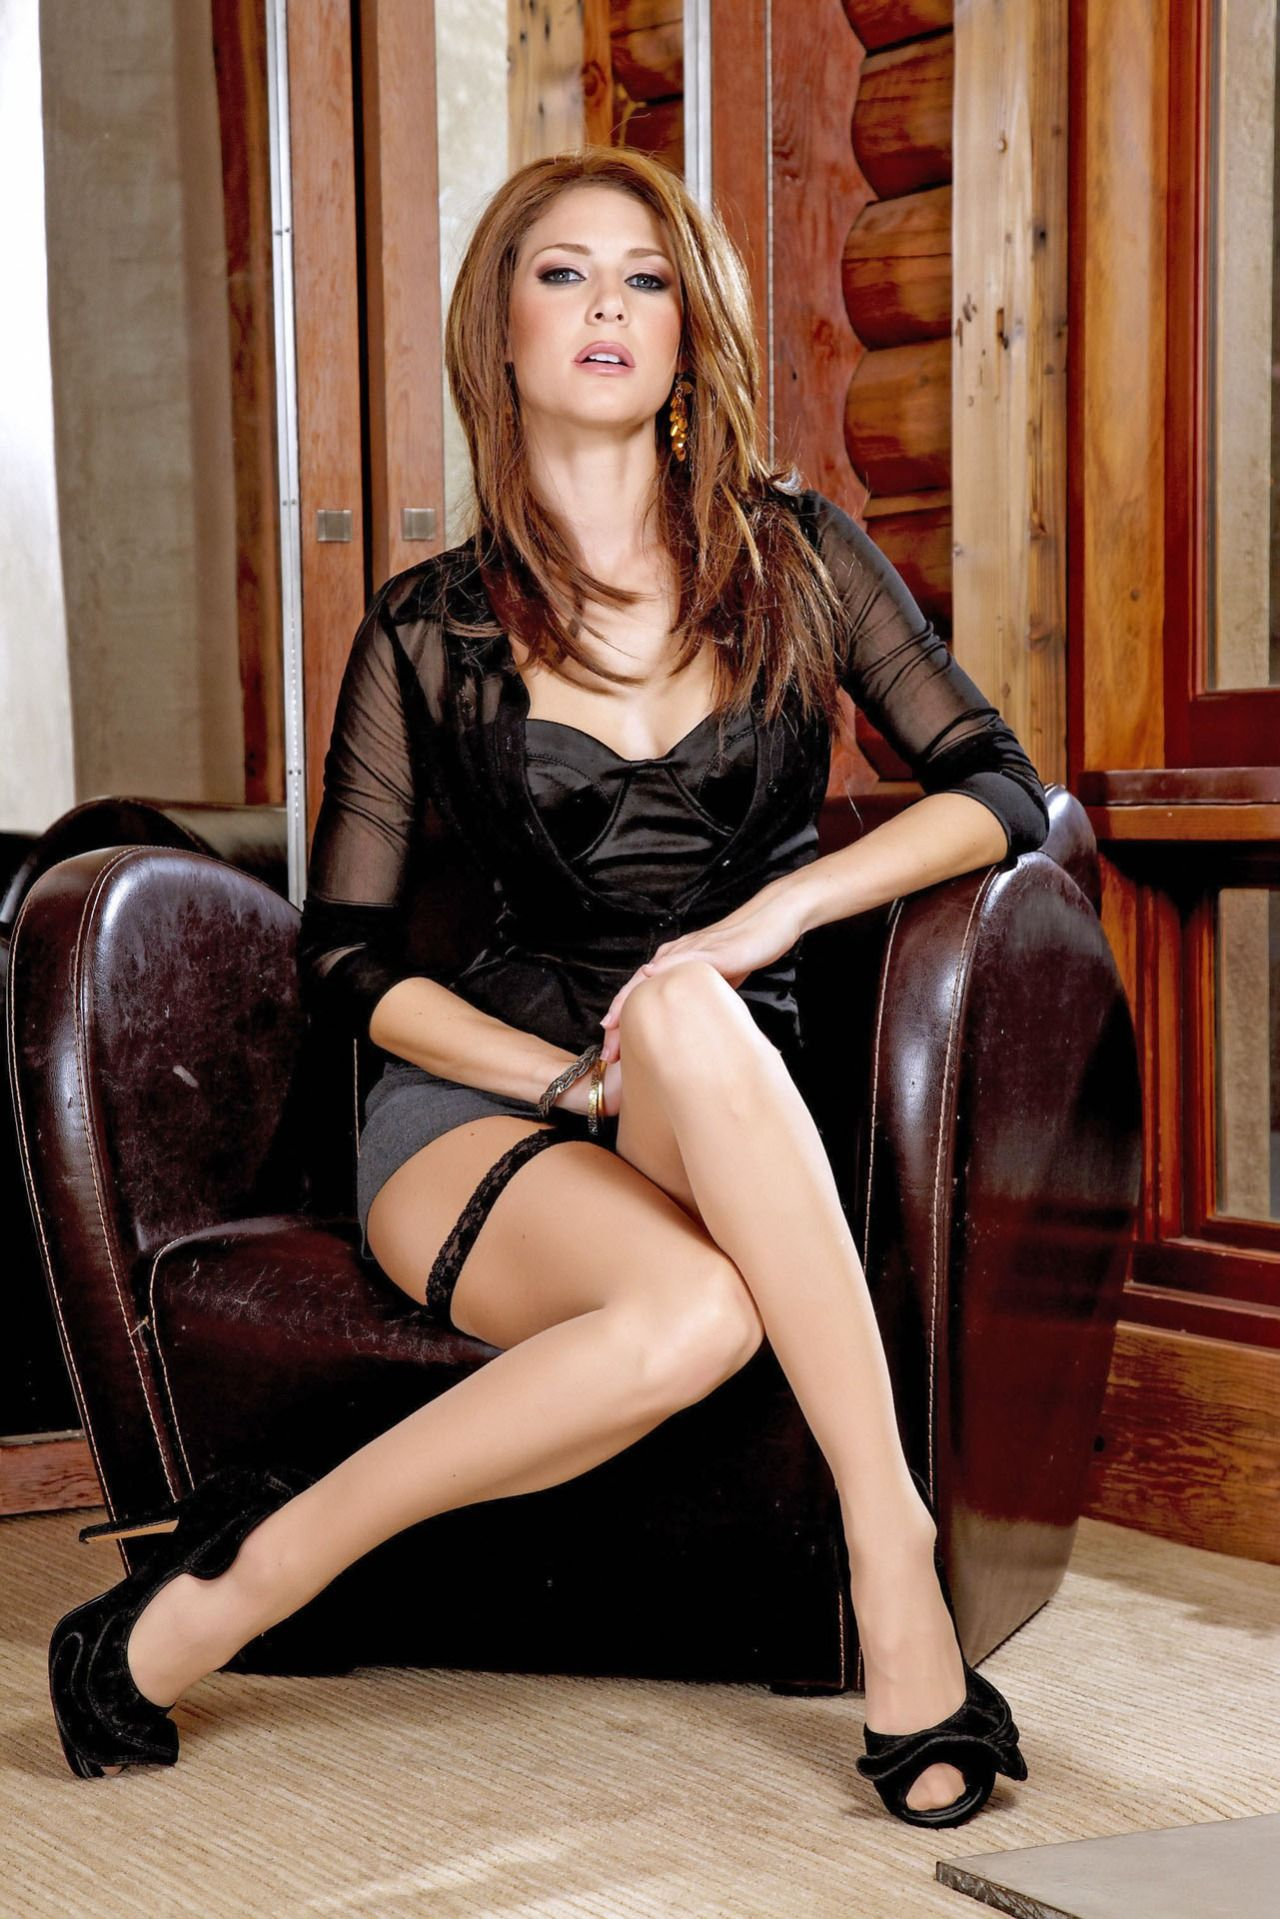 Beautiful women wearing stockings